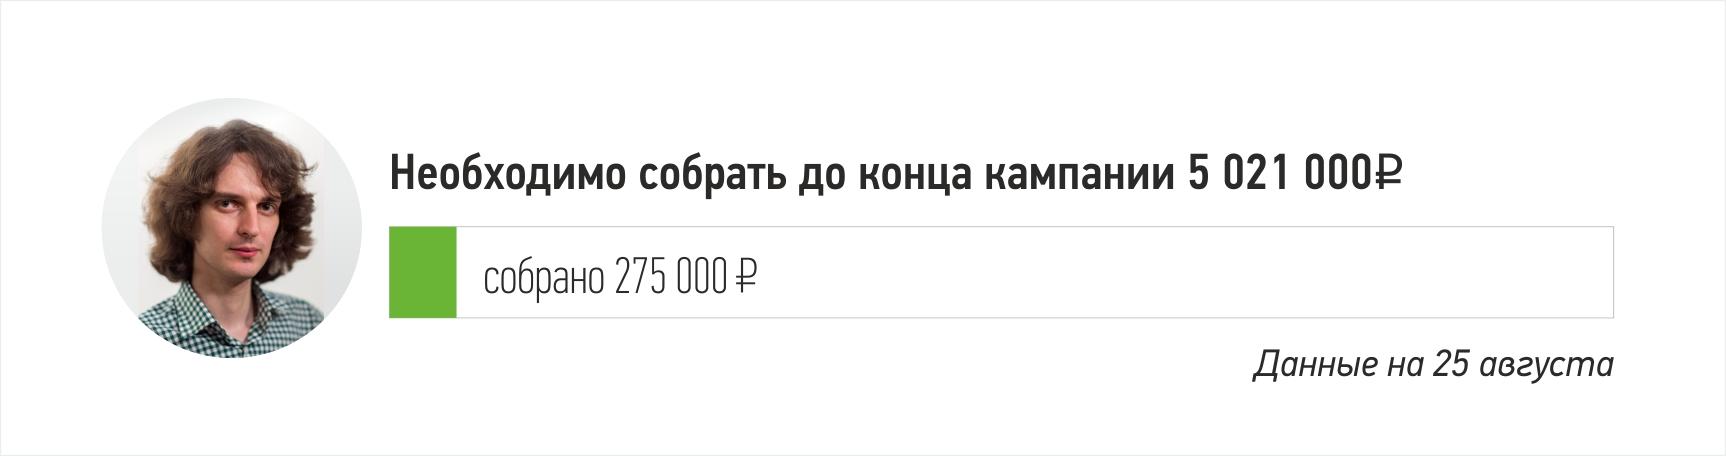 soroka_3